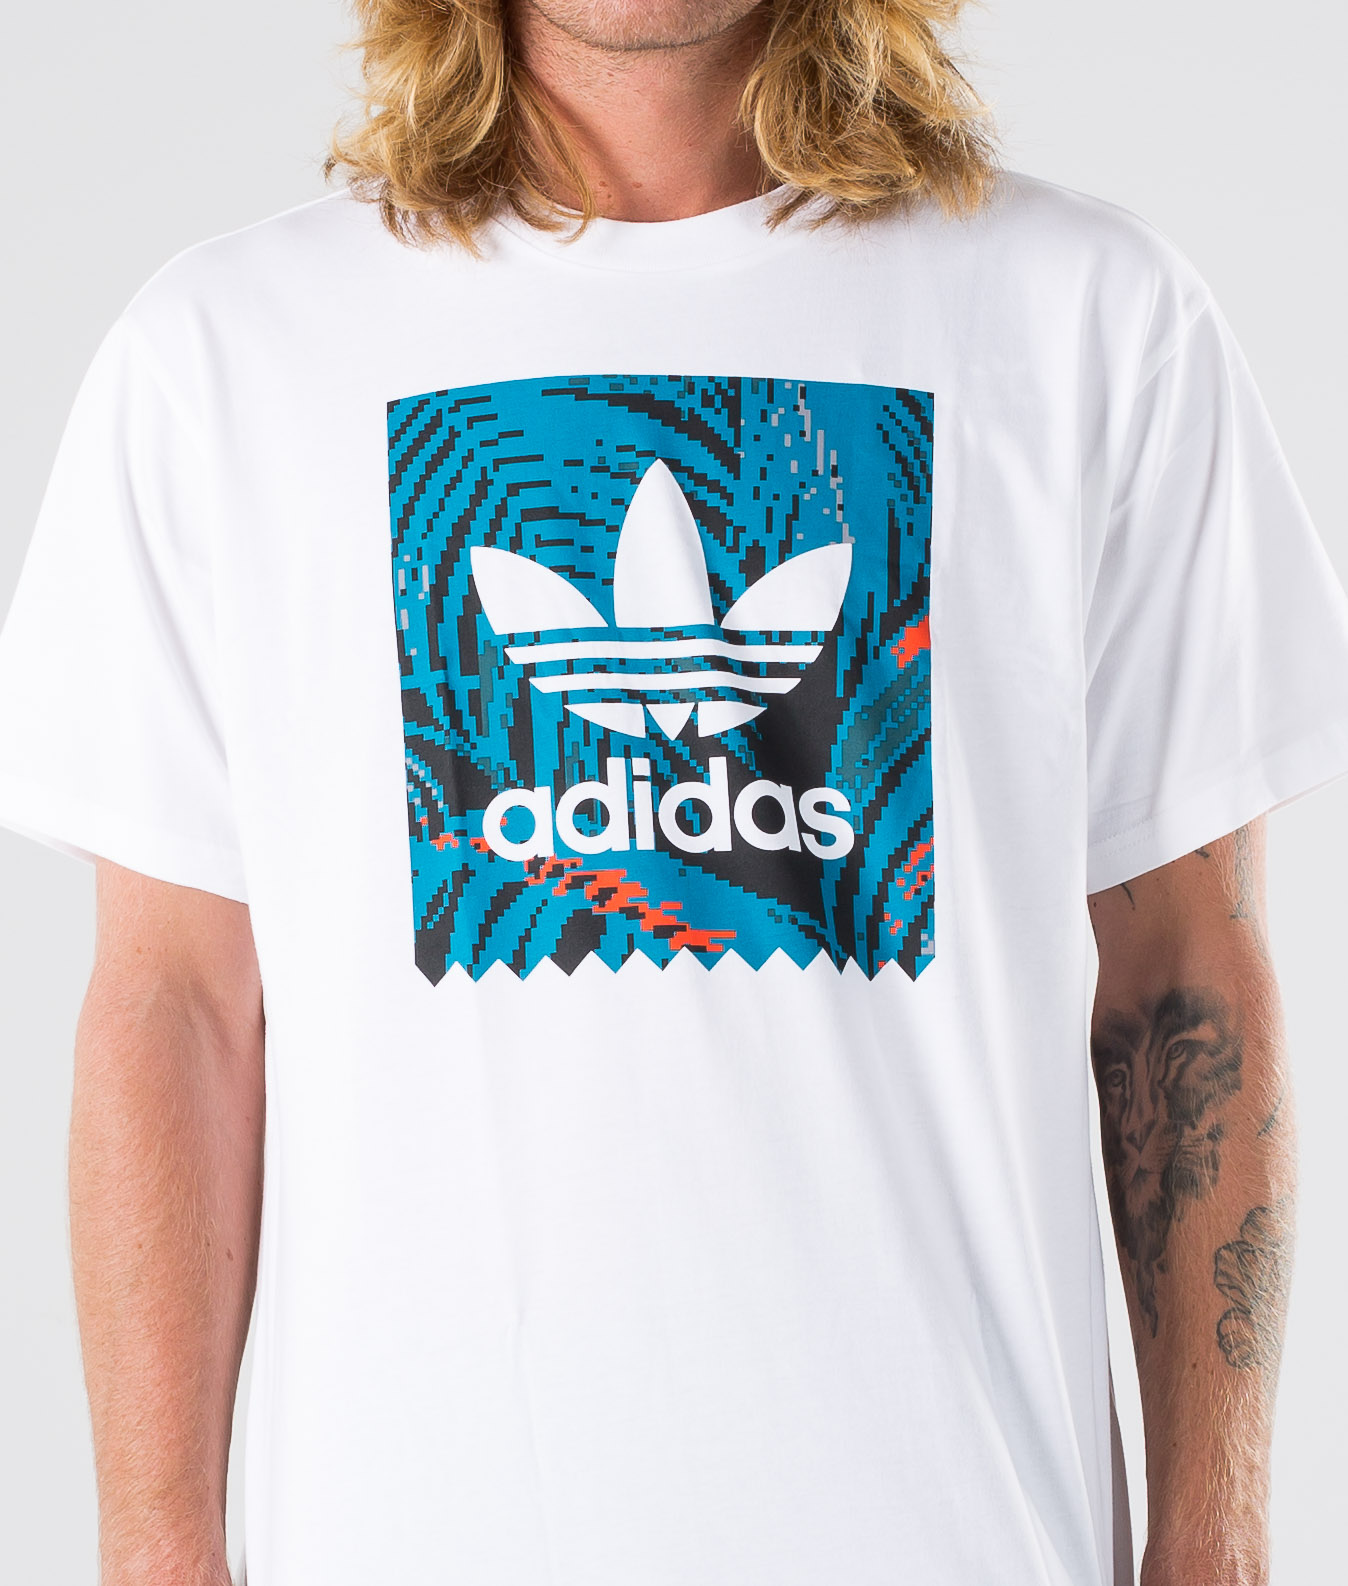 adidas shirt printing